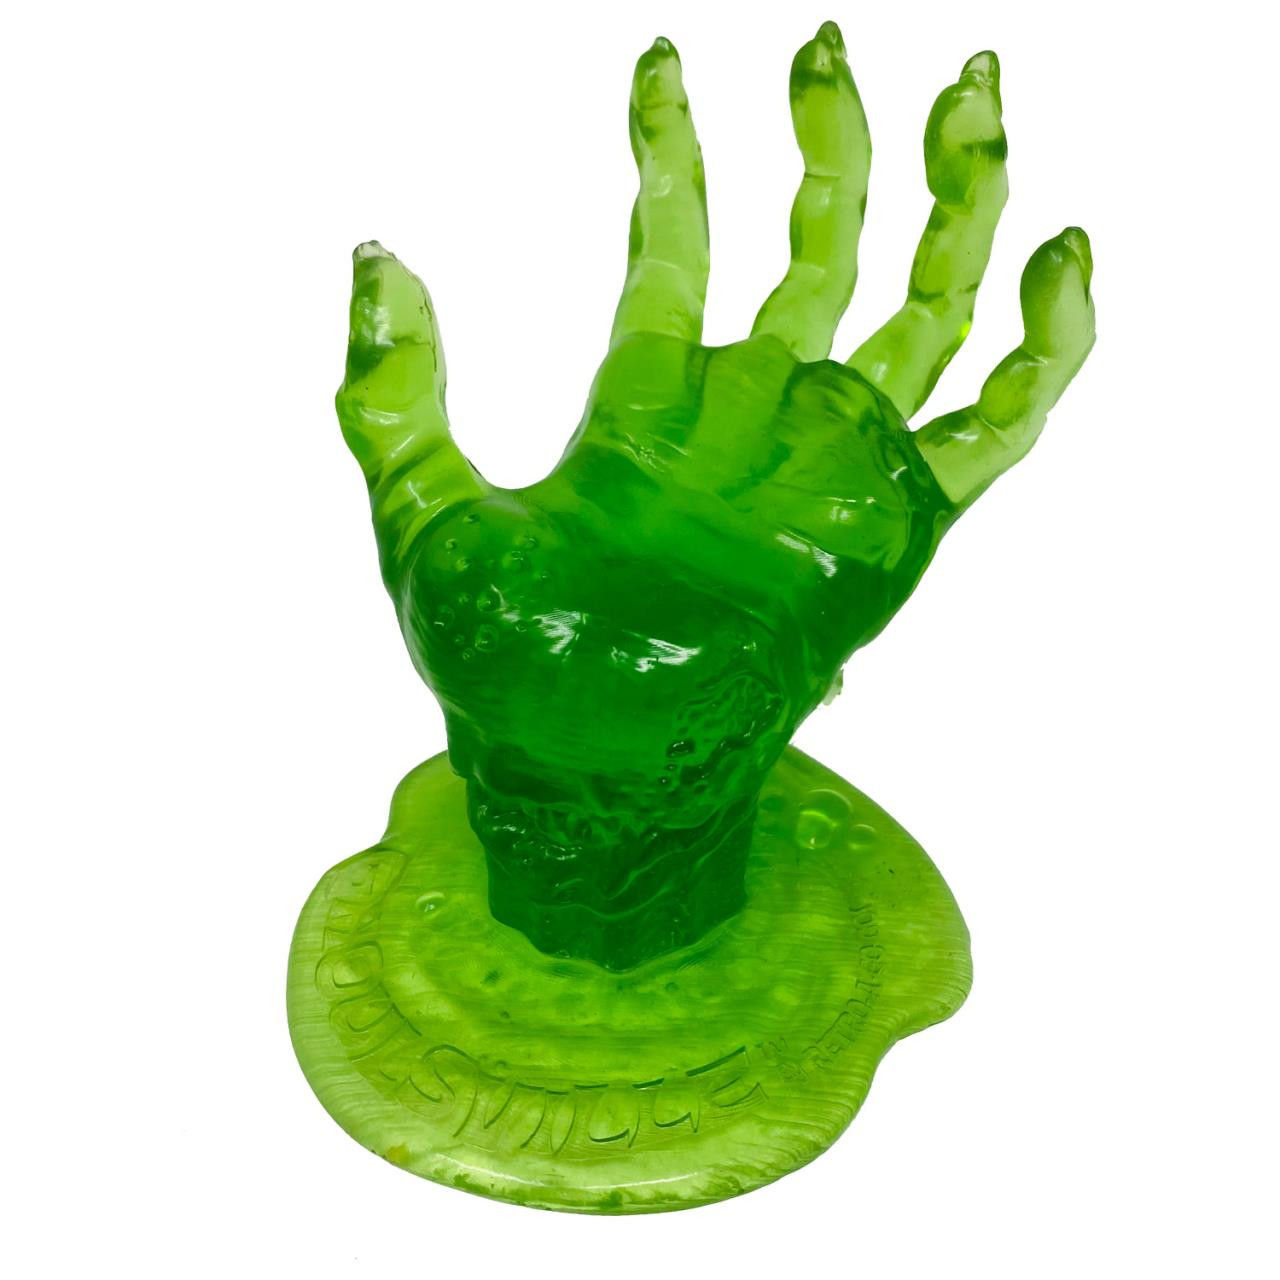 Radioactive Green Zombie Display Hand* - 0659682810072